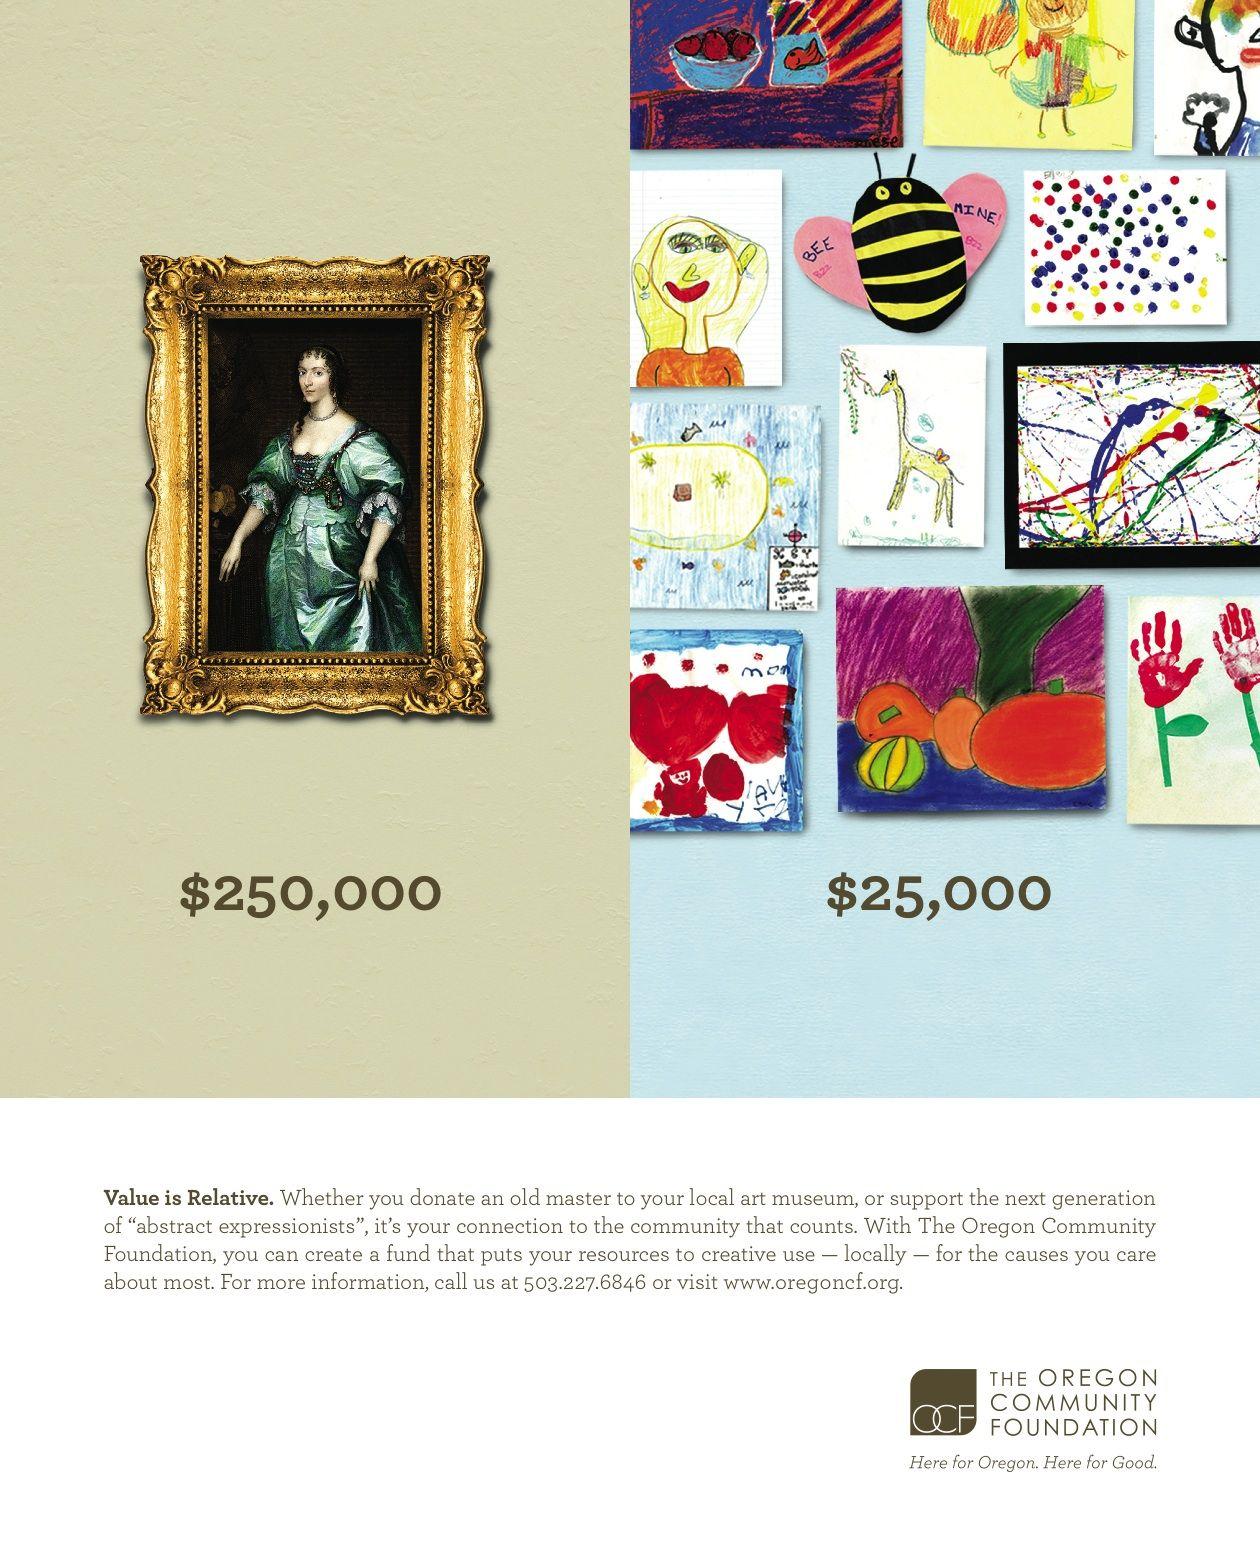 Oregon Community Foundation Print Ad: Masters vs. Kids